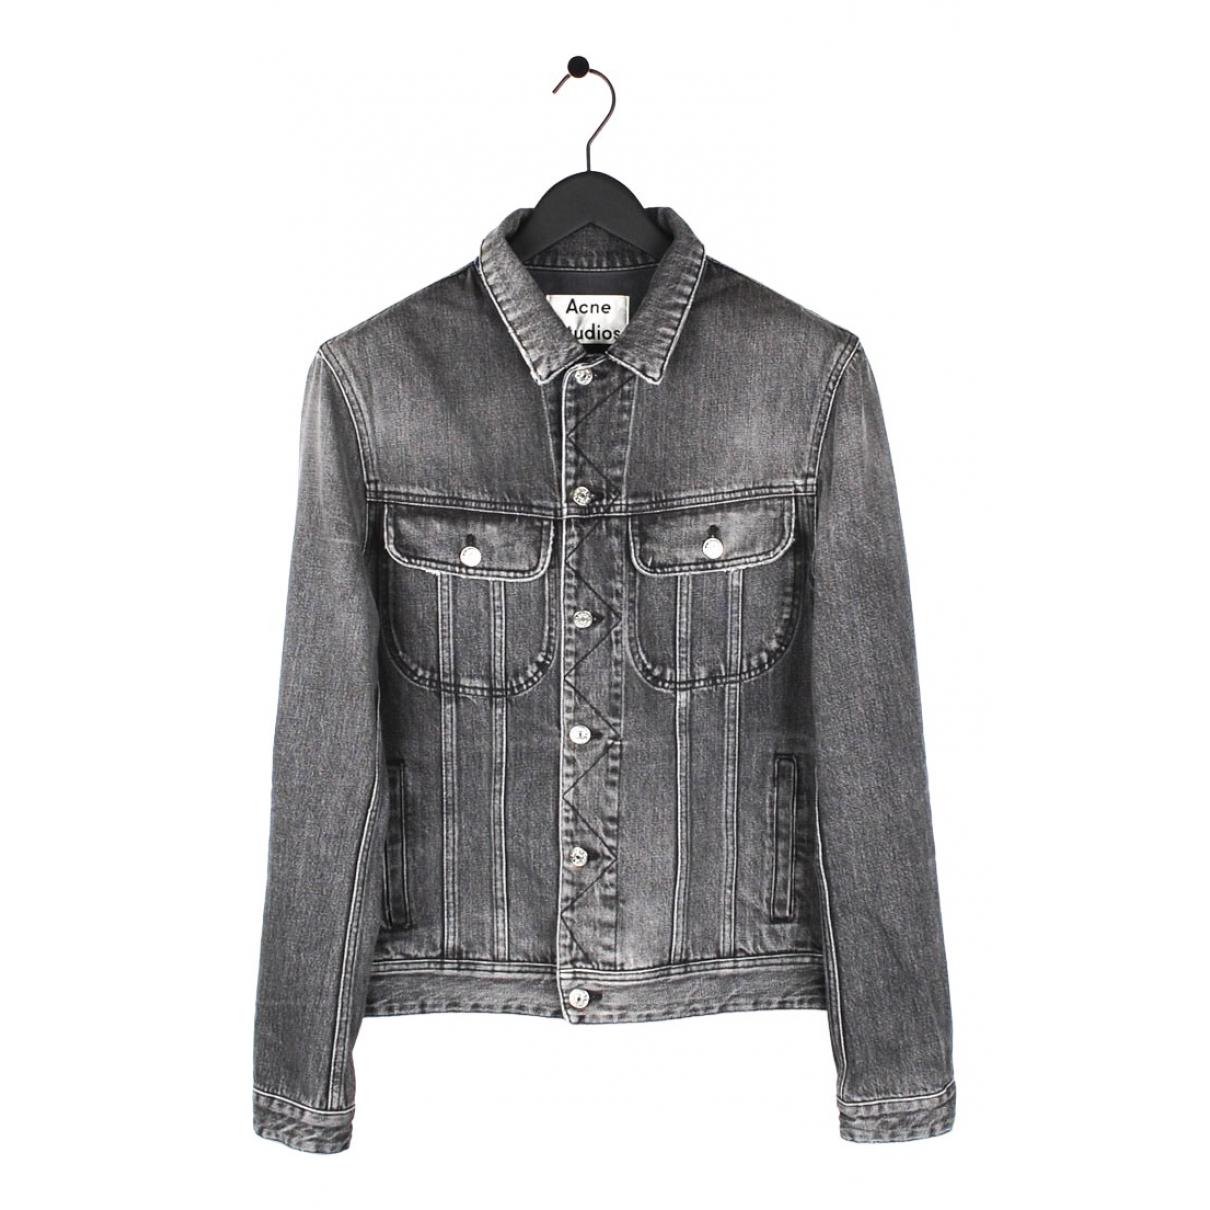 Acne Studios N Grey Cotton jacket  for Men S International